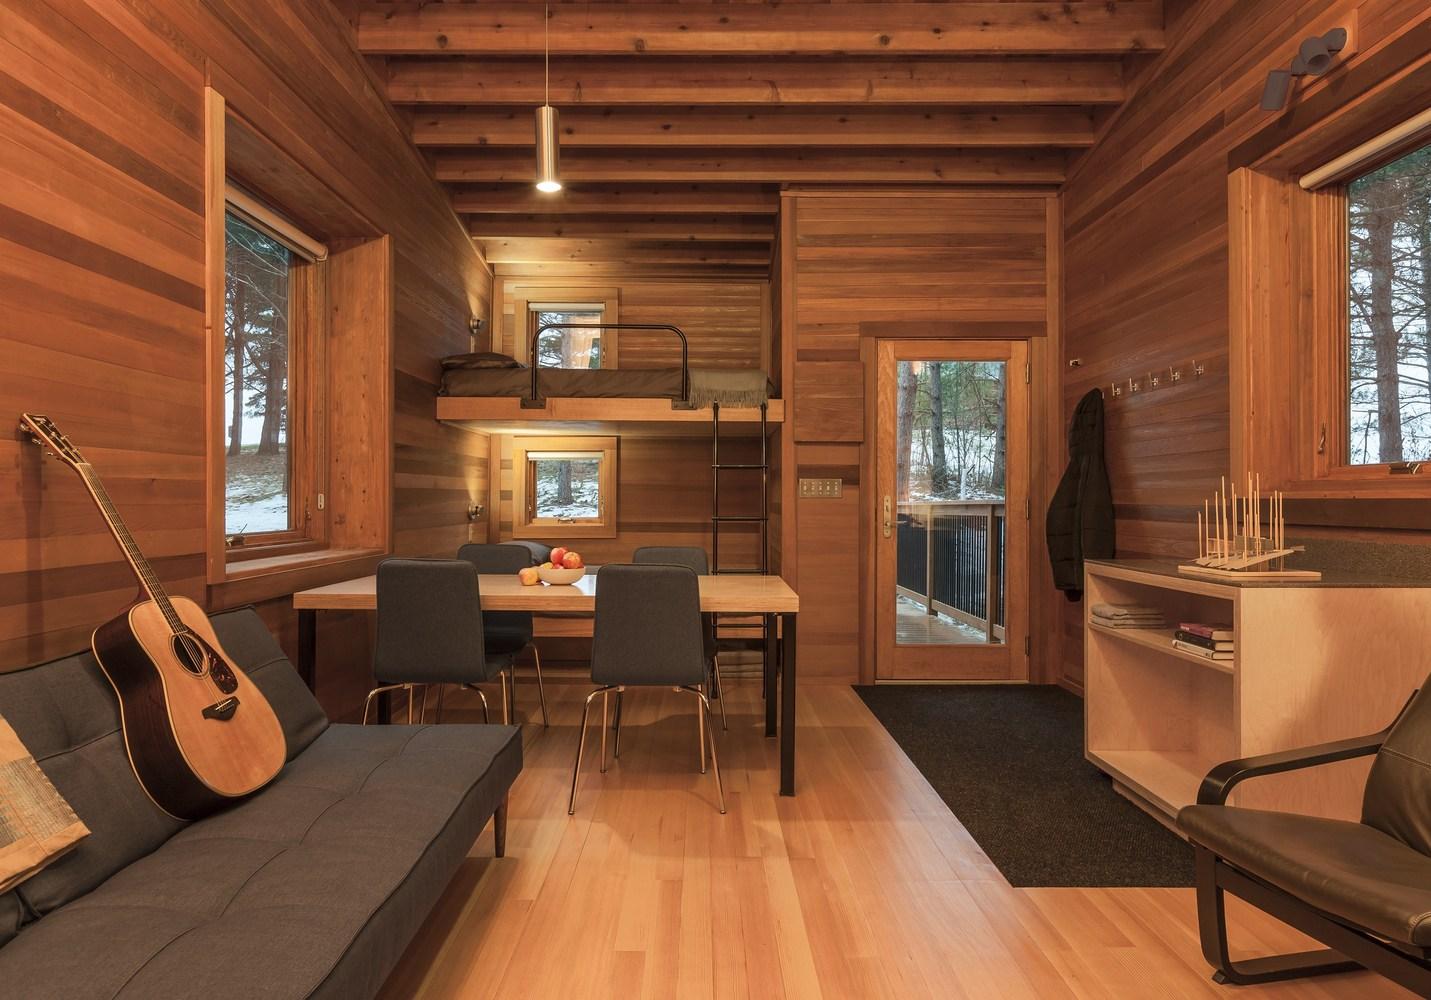 Refugio Cabañas campistas del parque regional Whitetail Woods – HGA Architects and Engineers